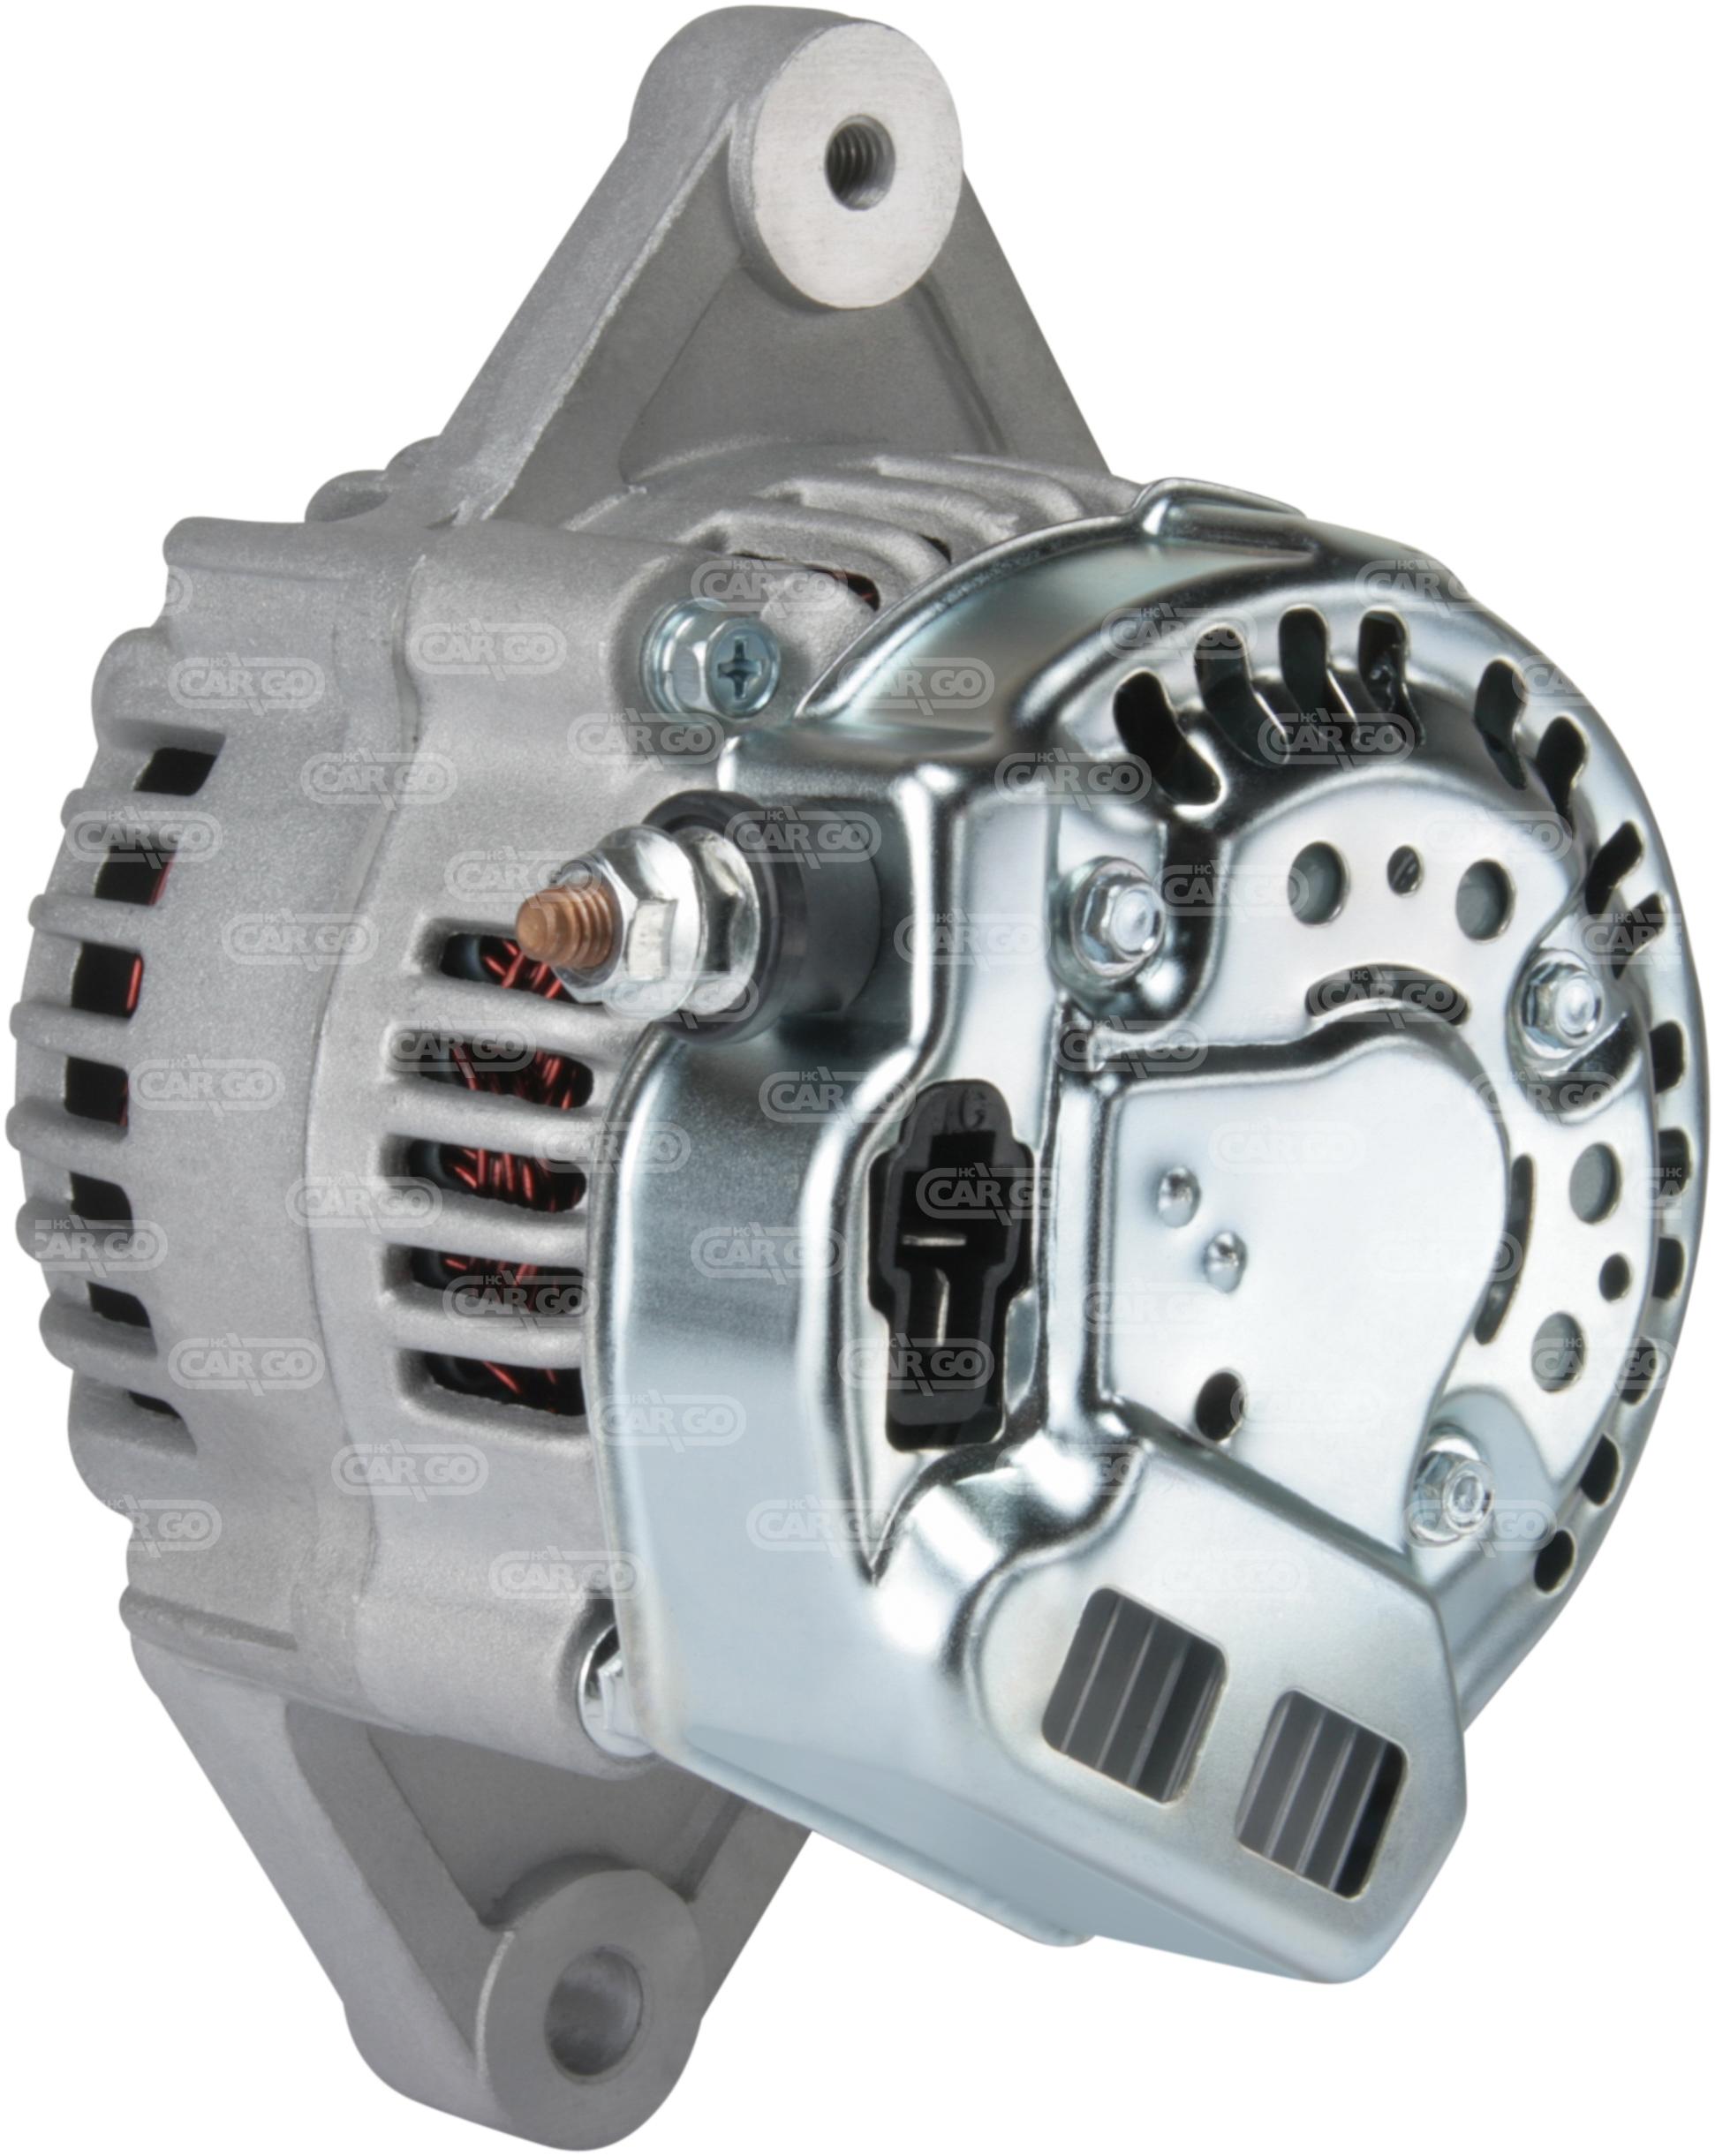 Alternateur 319 Voltage14 Amp45